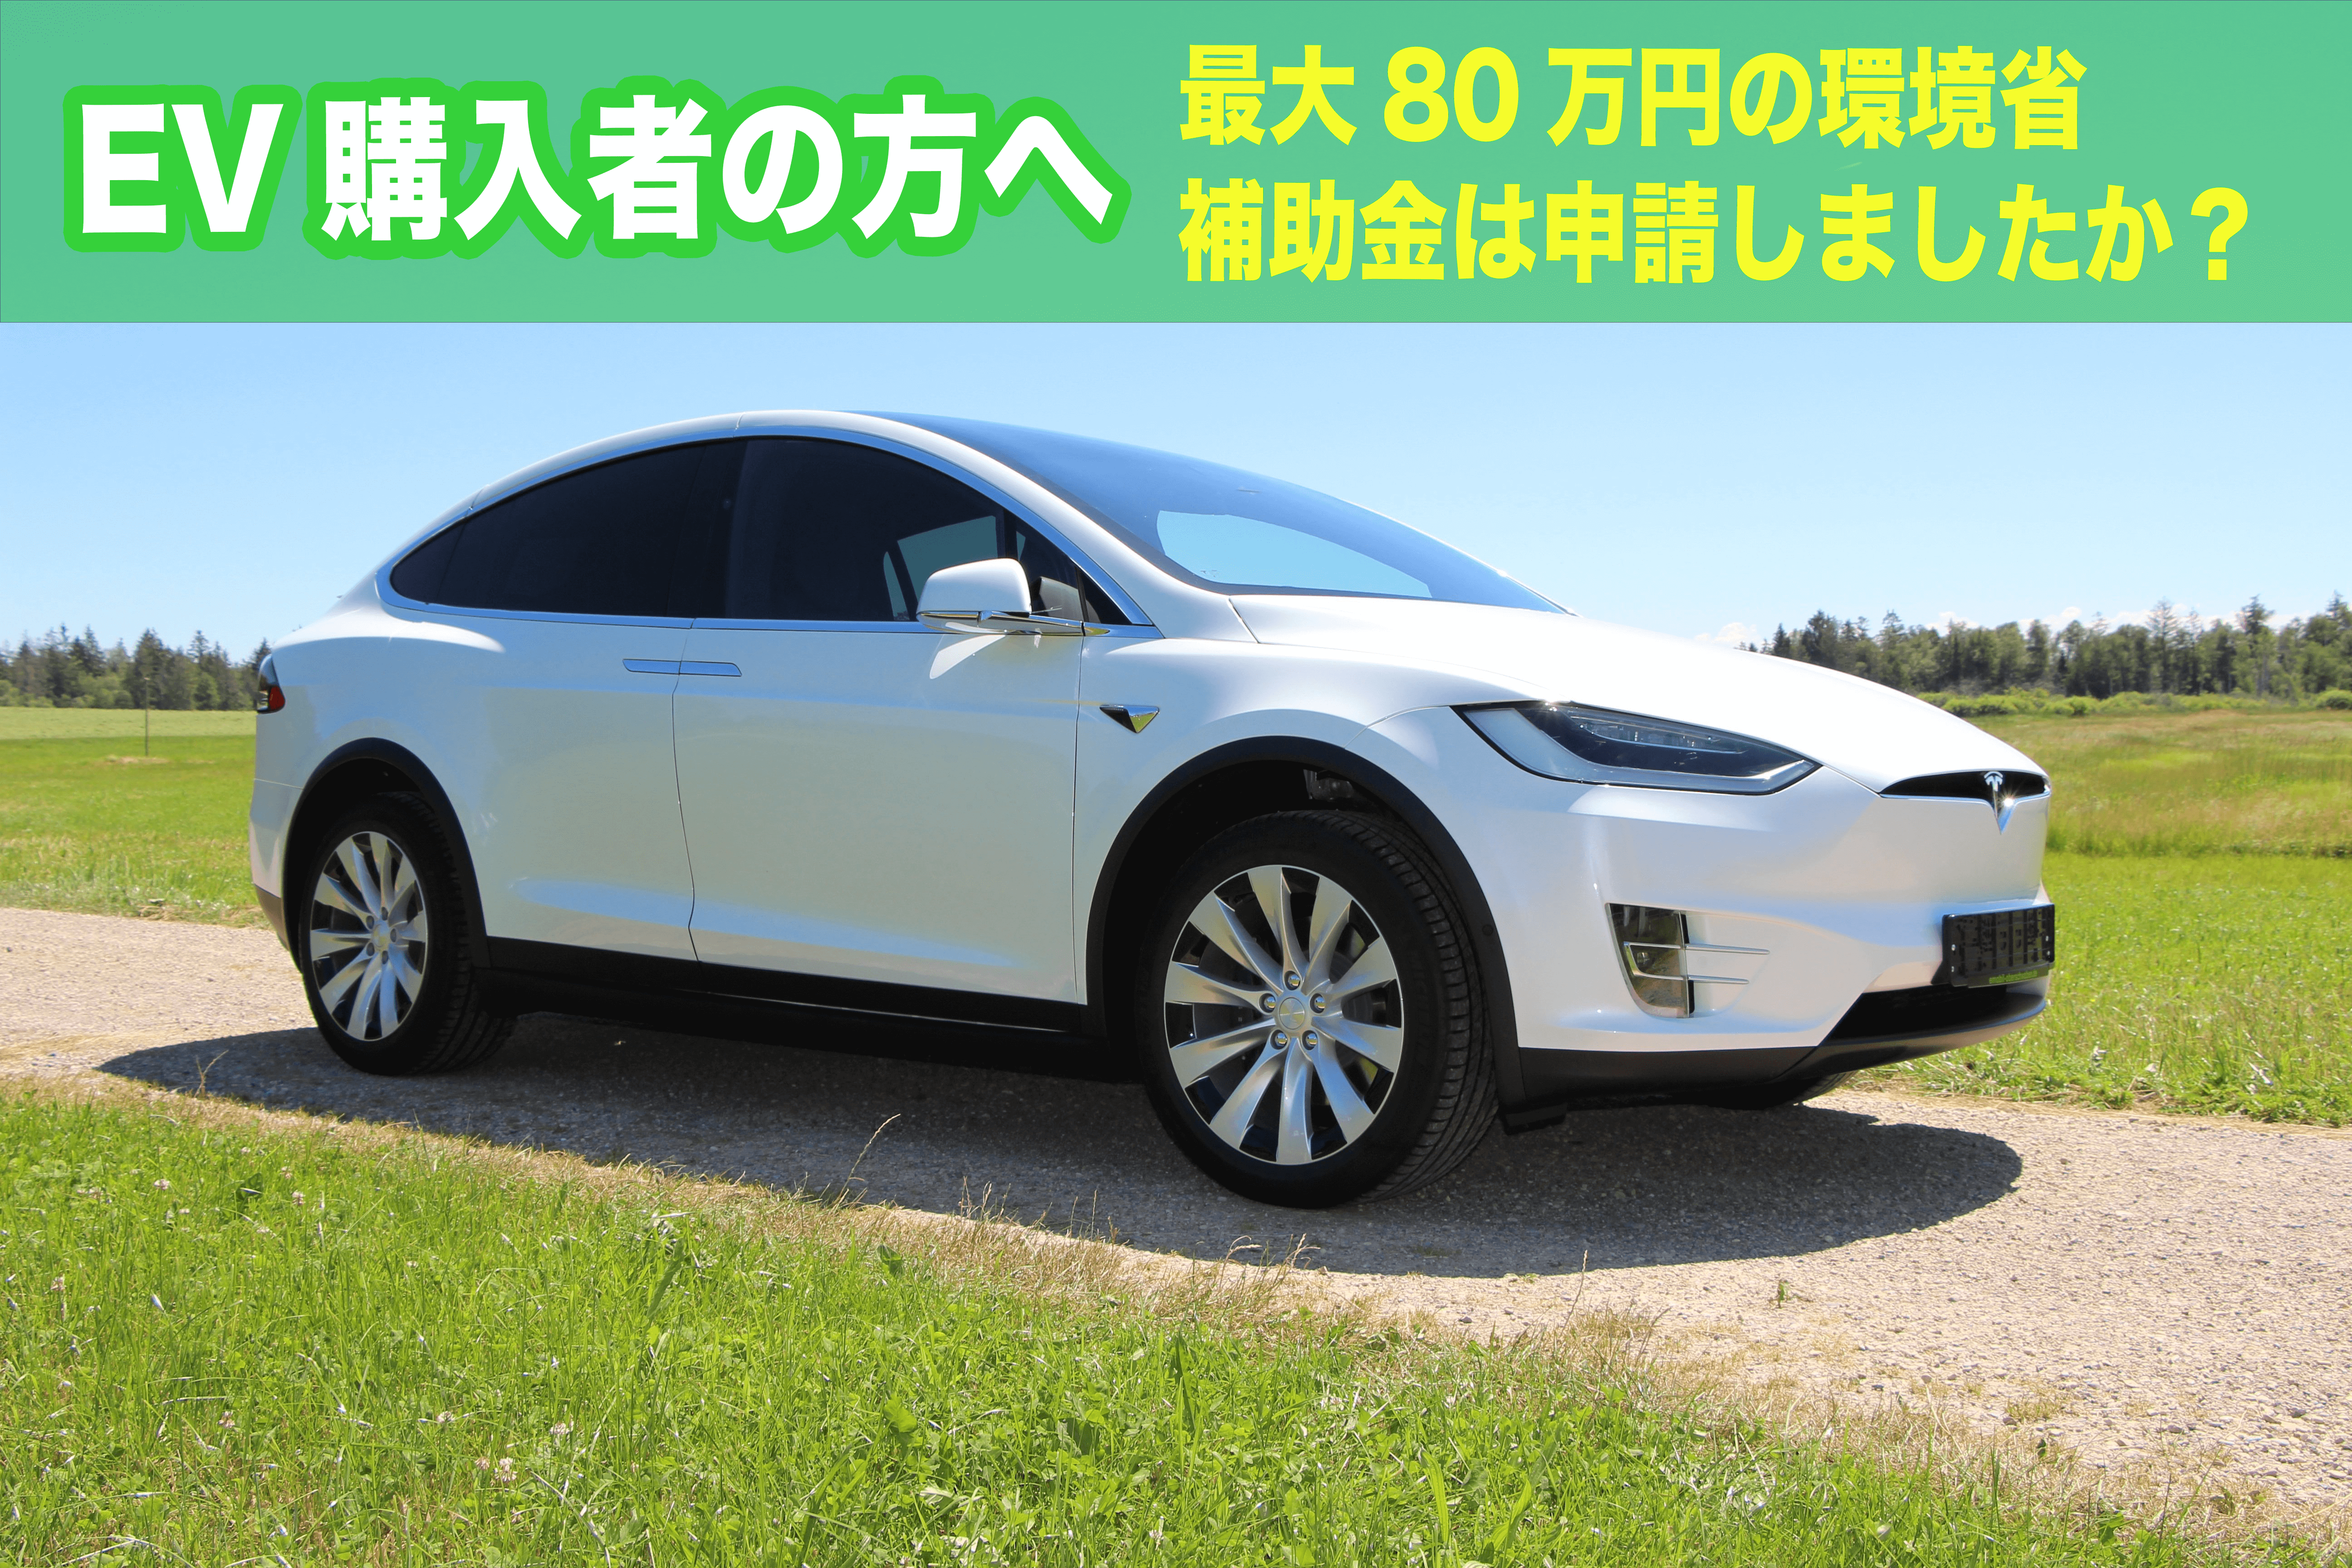 EV(電気自動車)購入者の方へ 最大80万円の環境省補助金は申請しましたか?